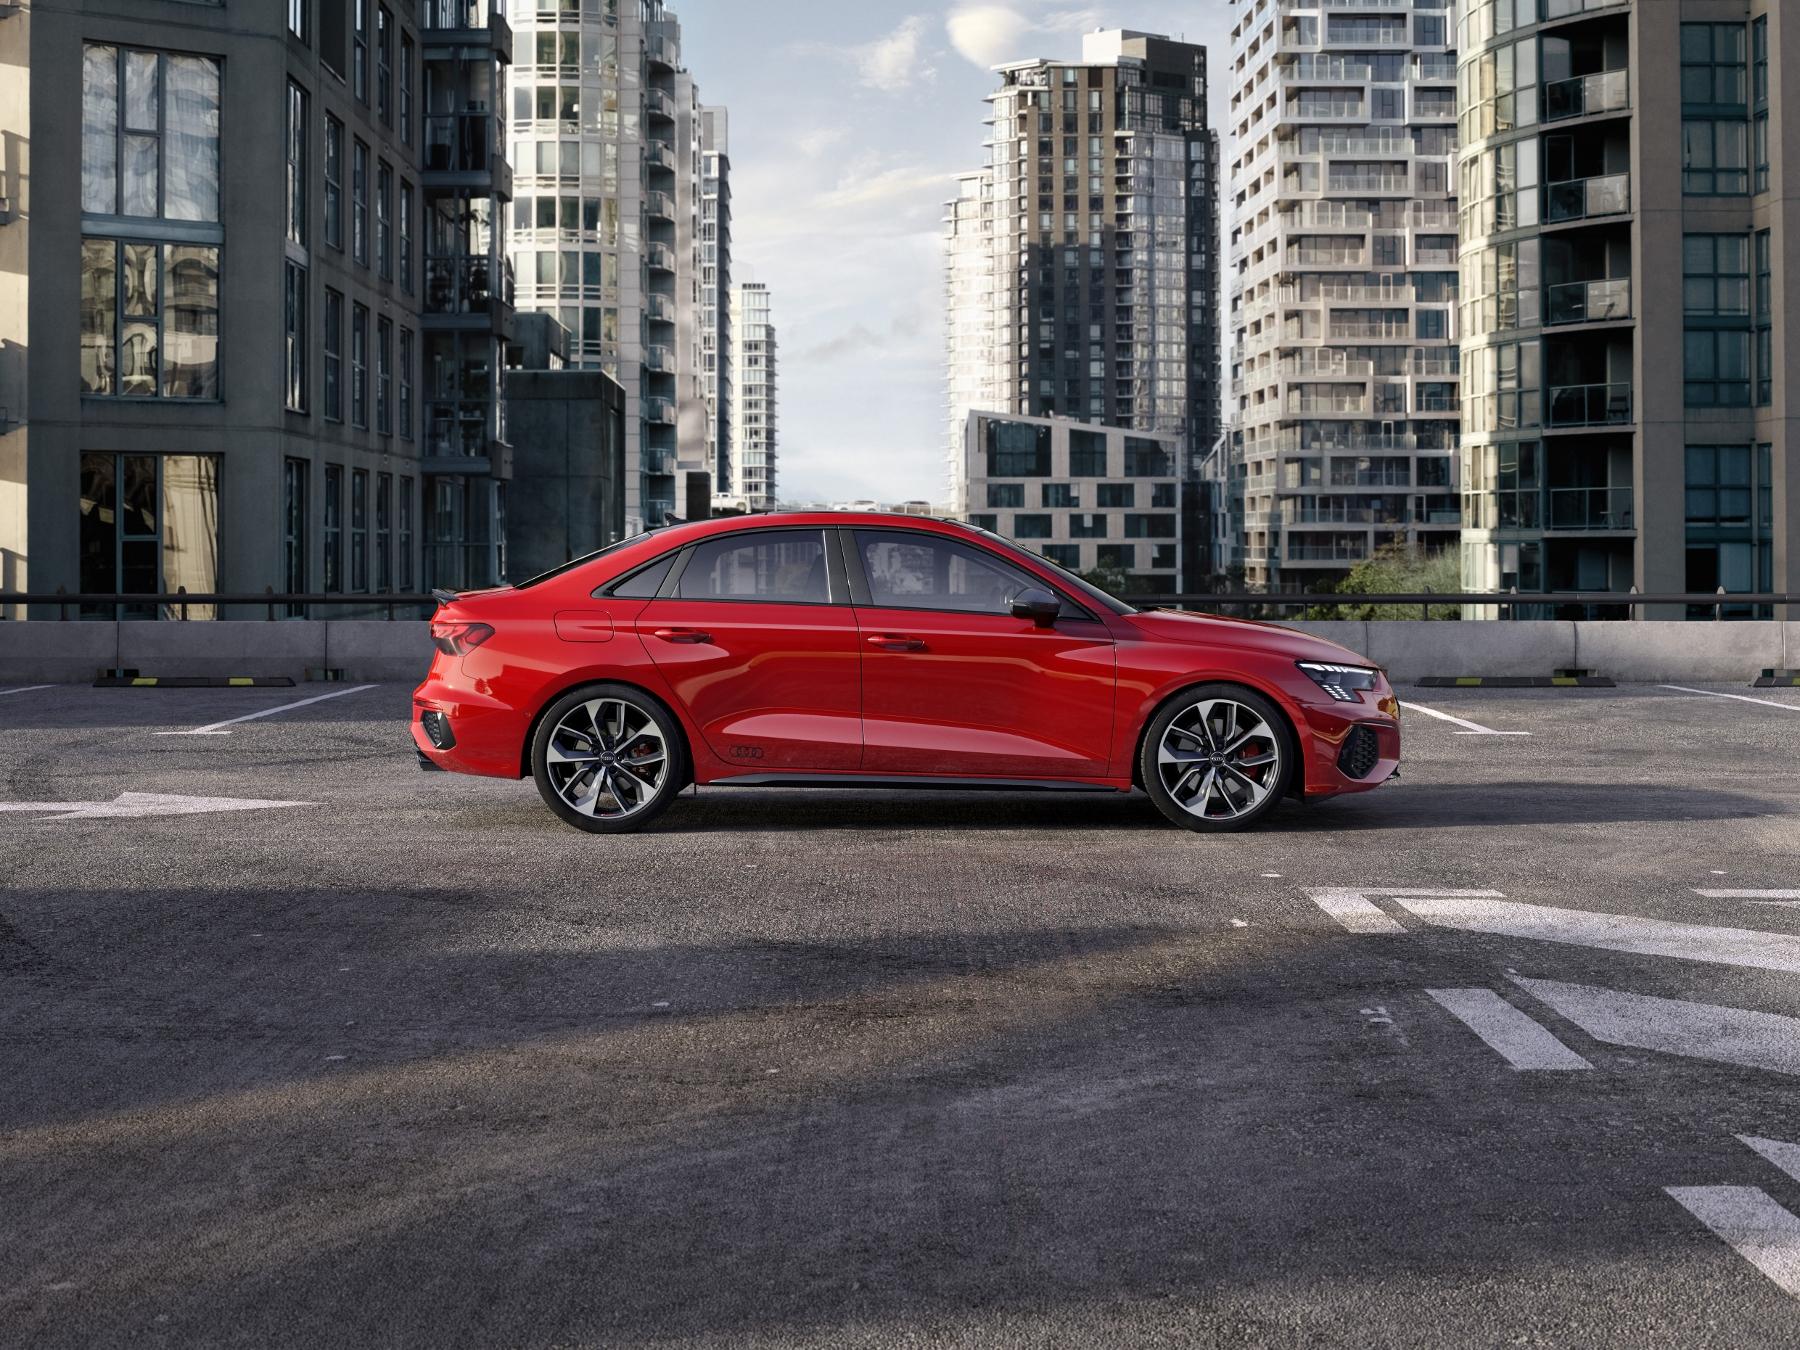 Audi ukázalo modely S3 Sedan a Sportback. Prezradilo aj nemeckú cenu gl3yBZnTQk a204366large-1800x13